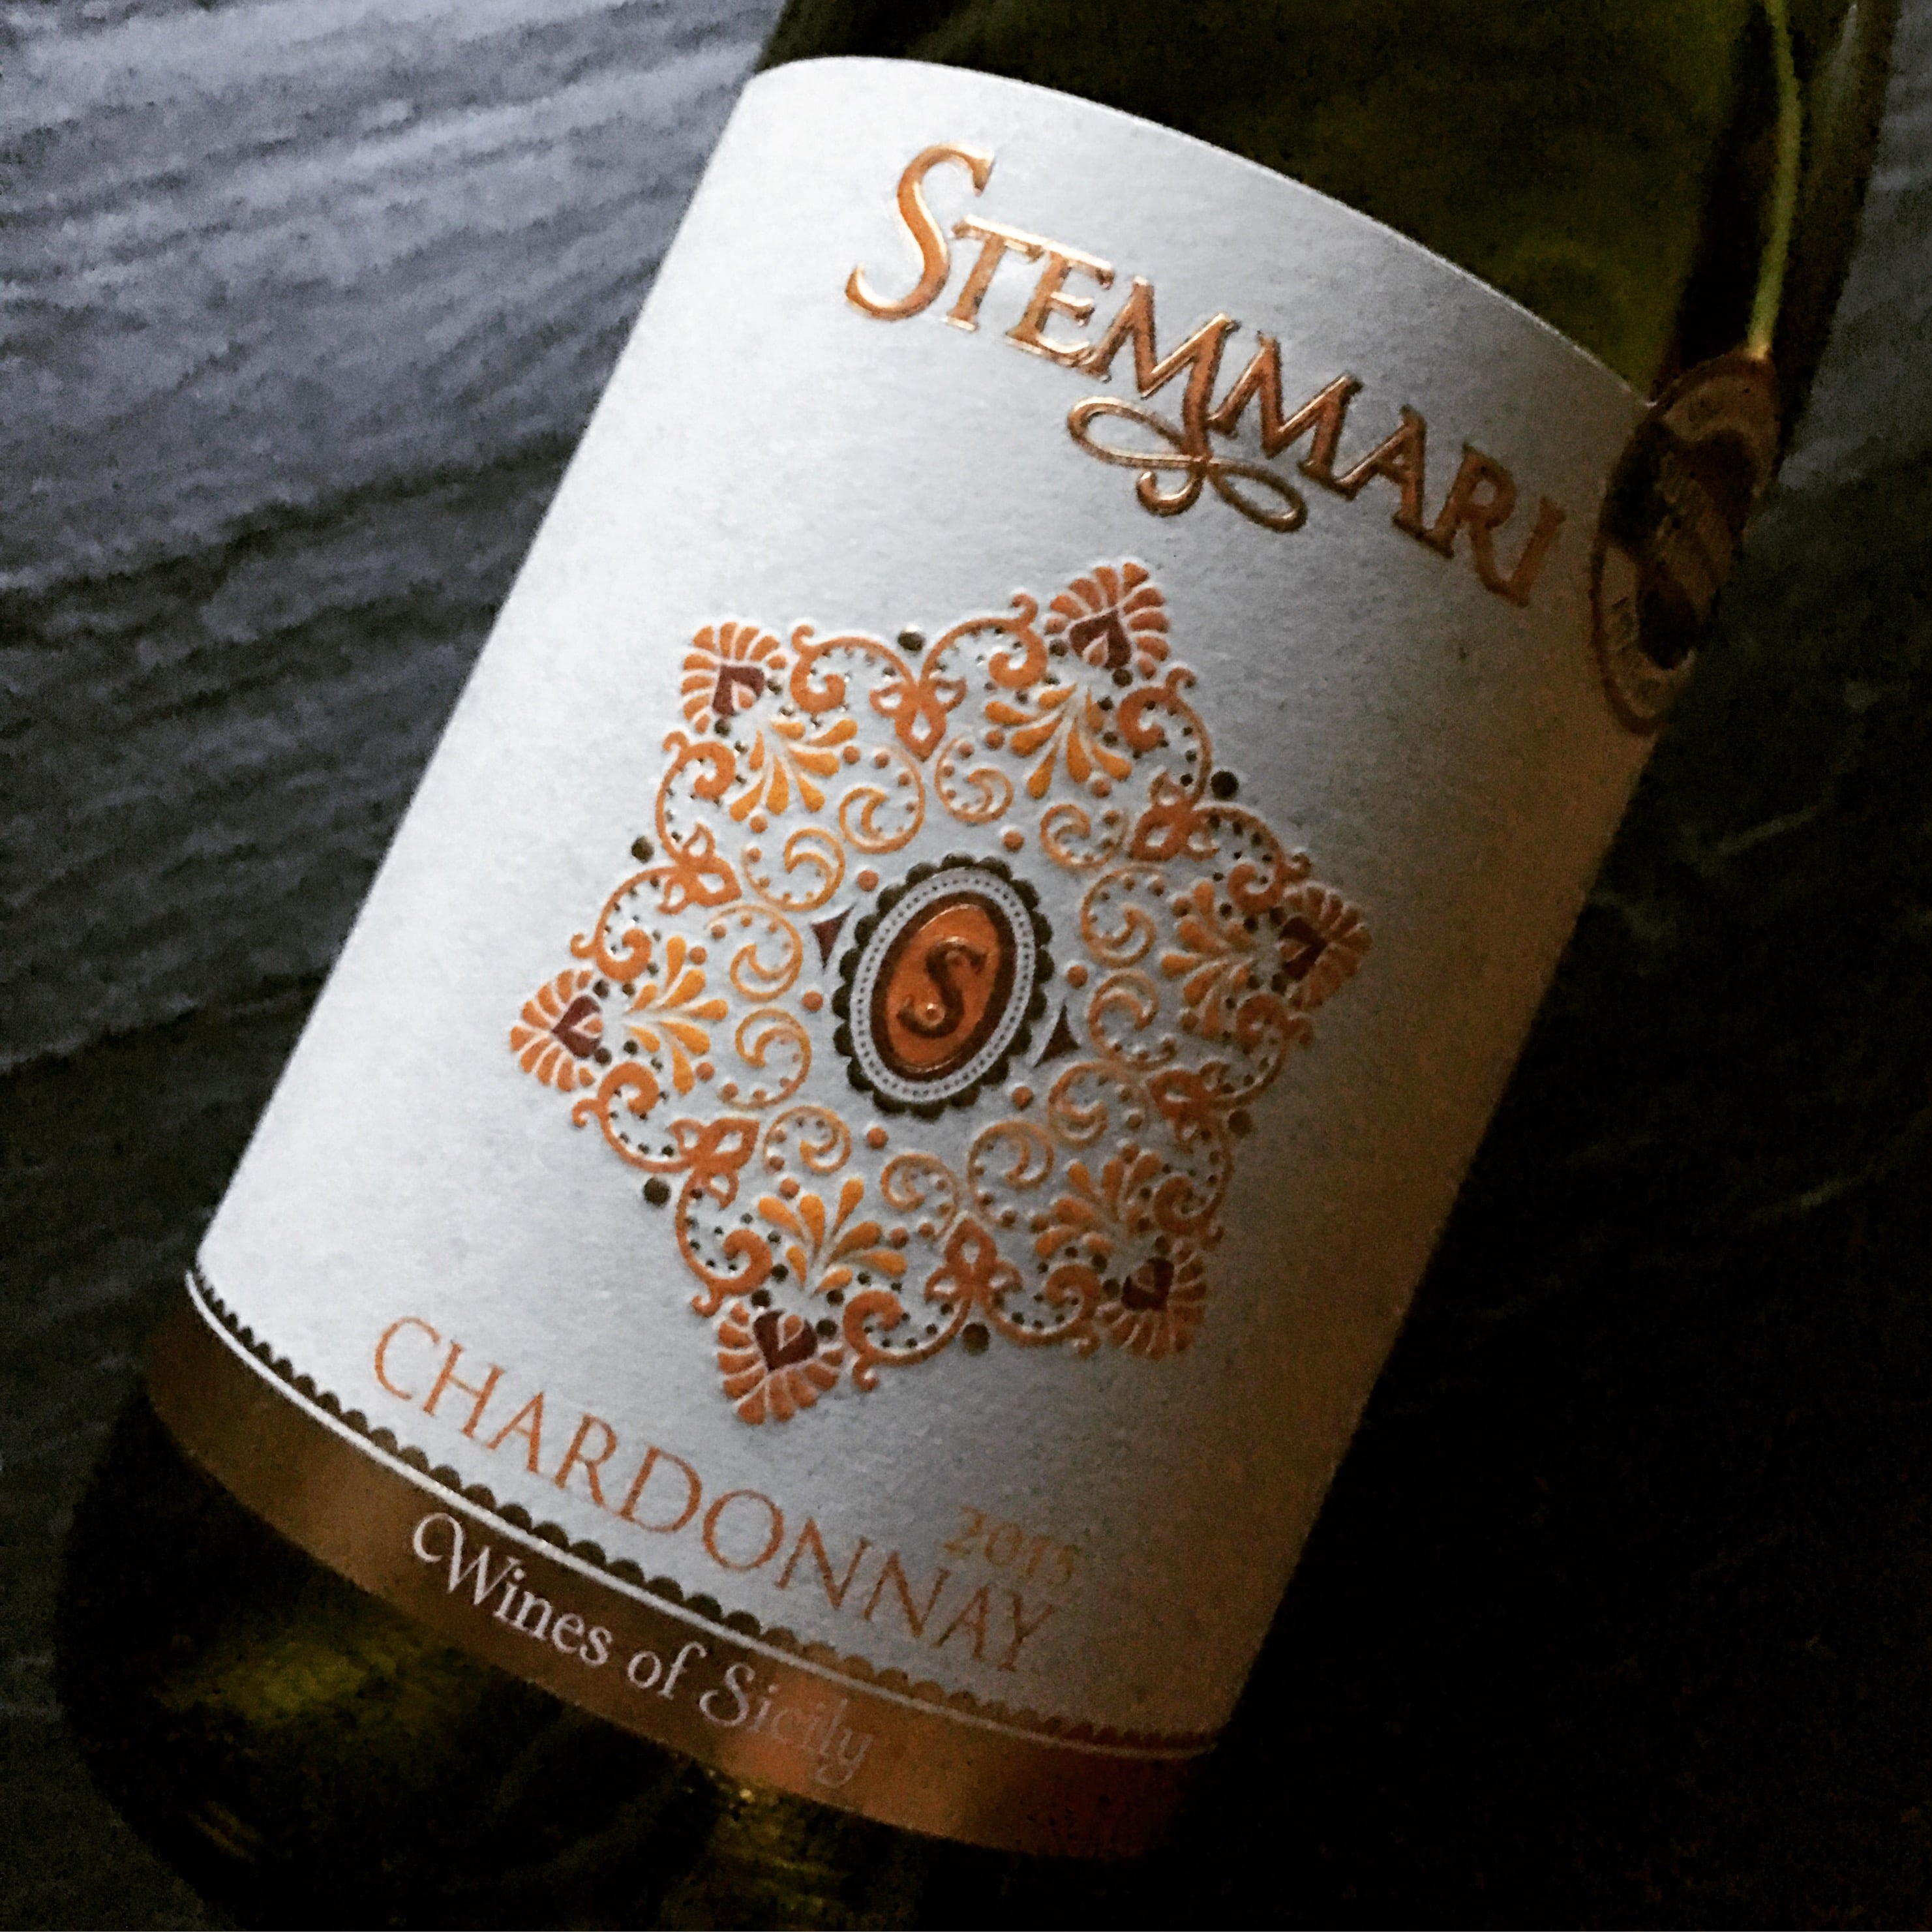 Feudo Arancio Chardonnay Sicilia Stemmari 2013